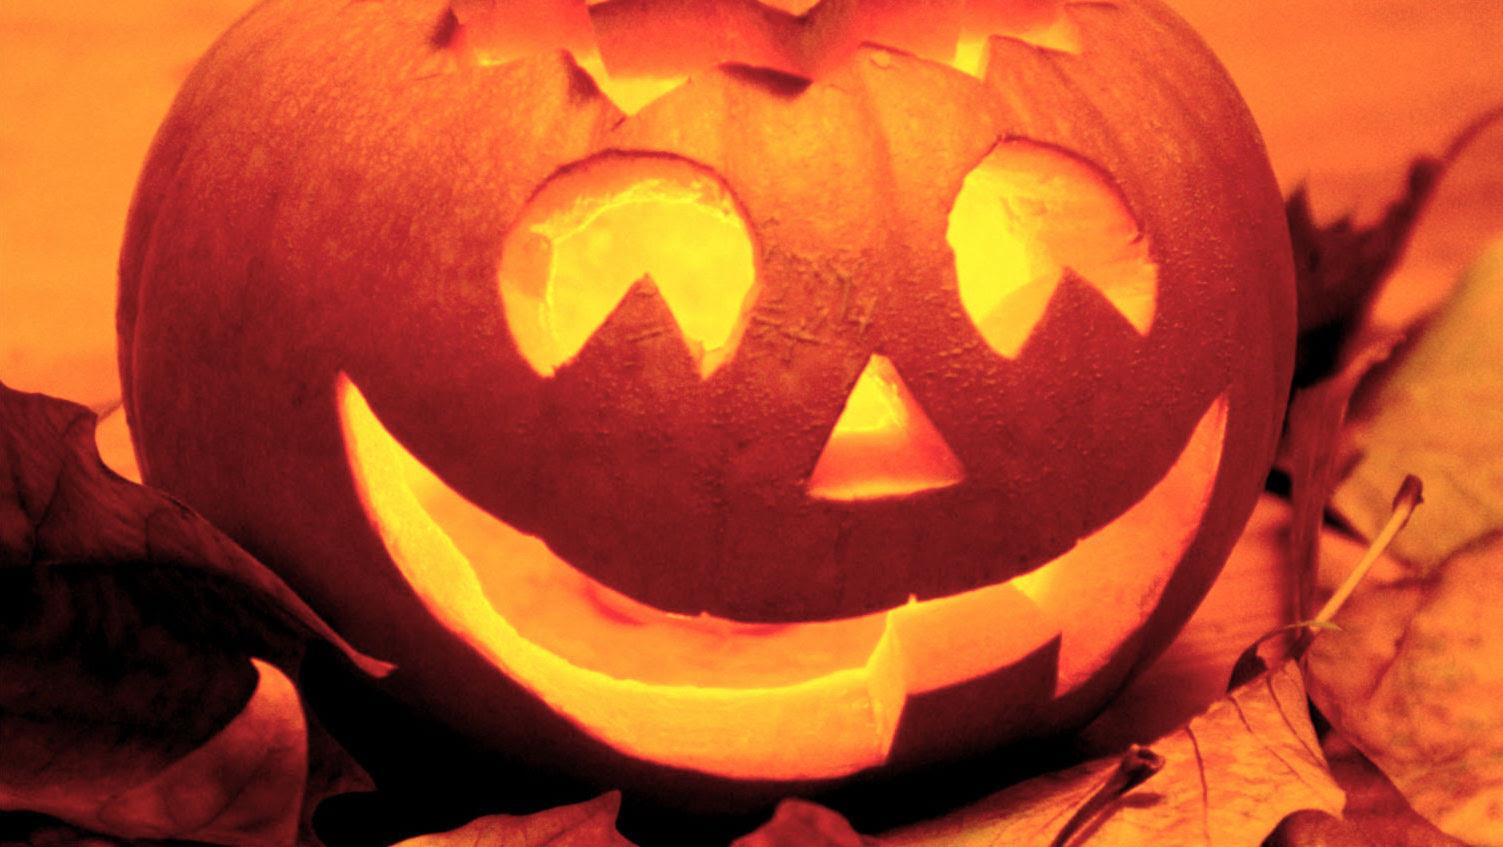 Pineroloplayit Il 31 Ottobre Halloween Arriva Anche A Porte